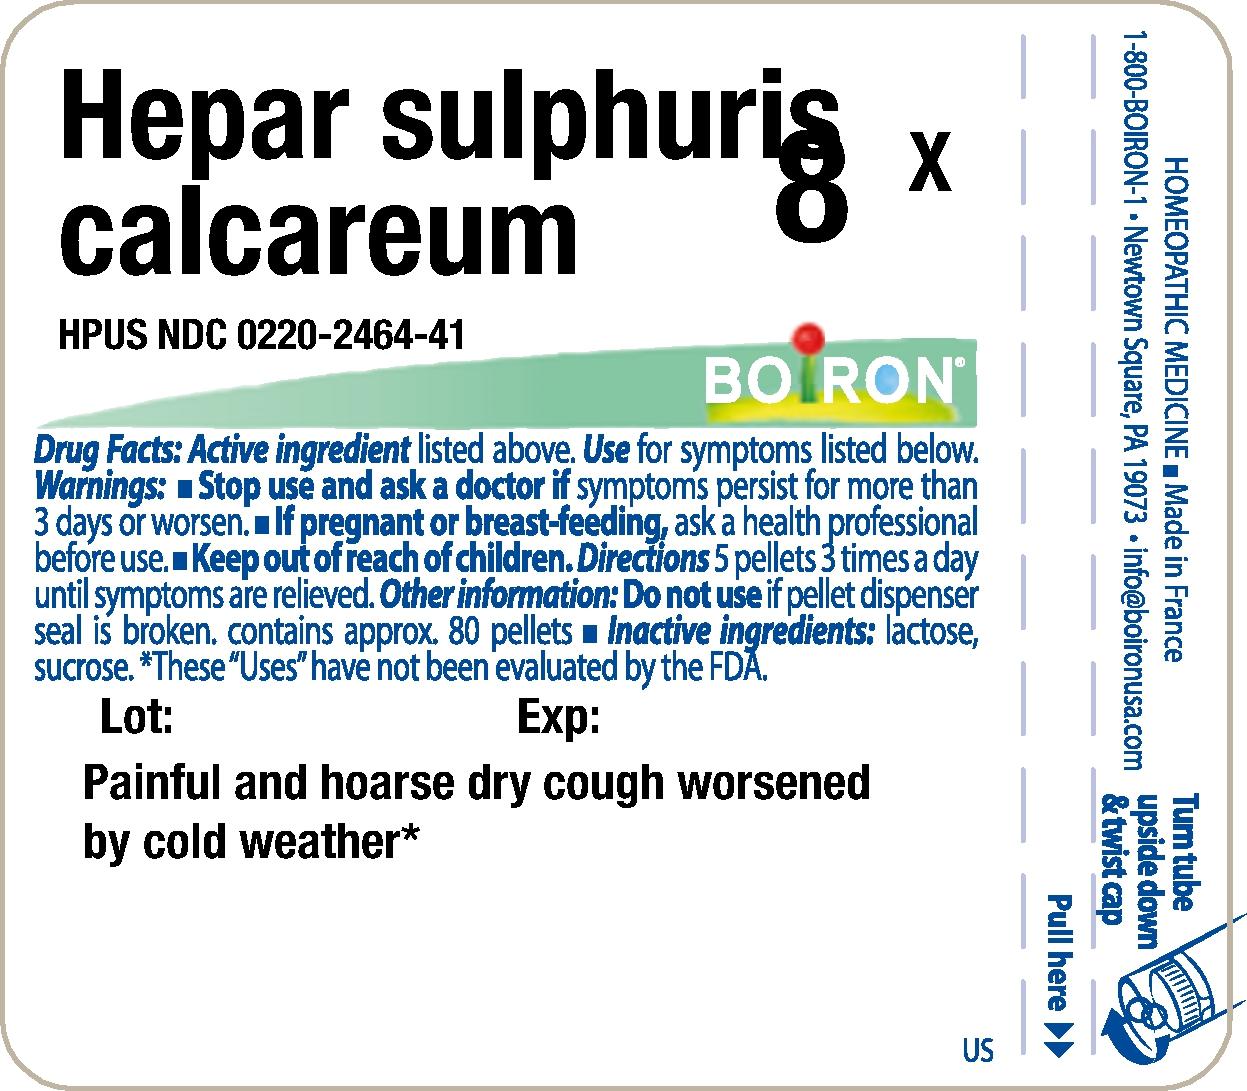 Hepar sulphuris label